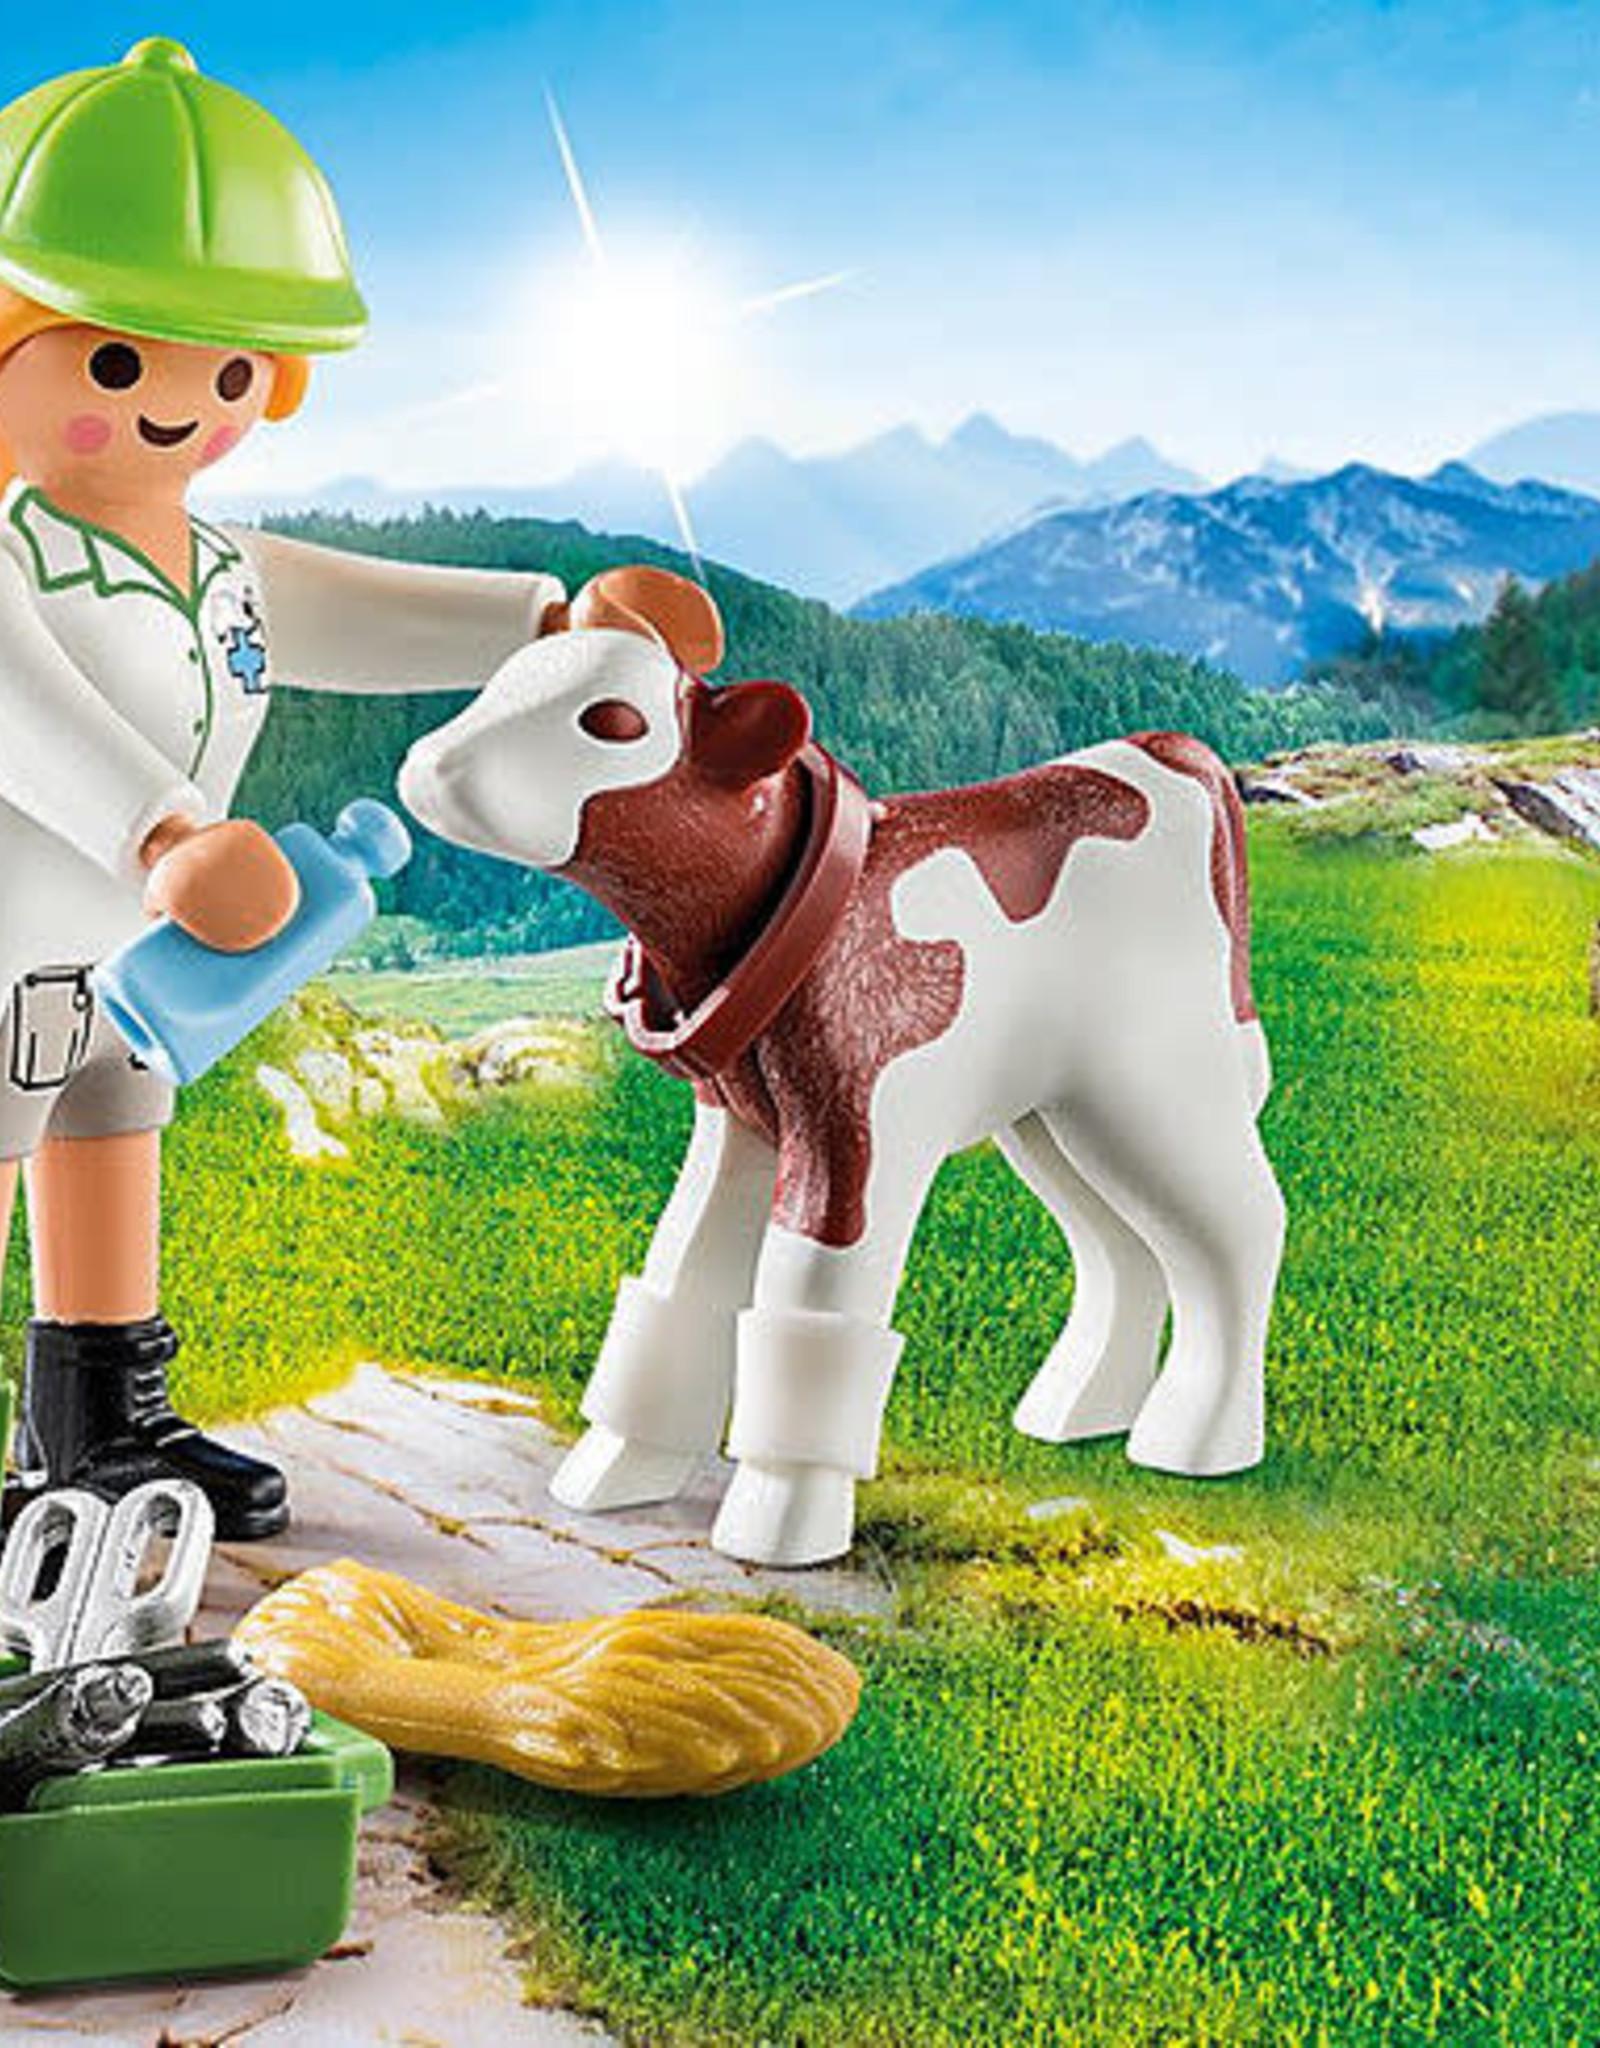 Playmobil PM Vet with Calf